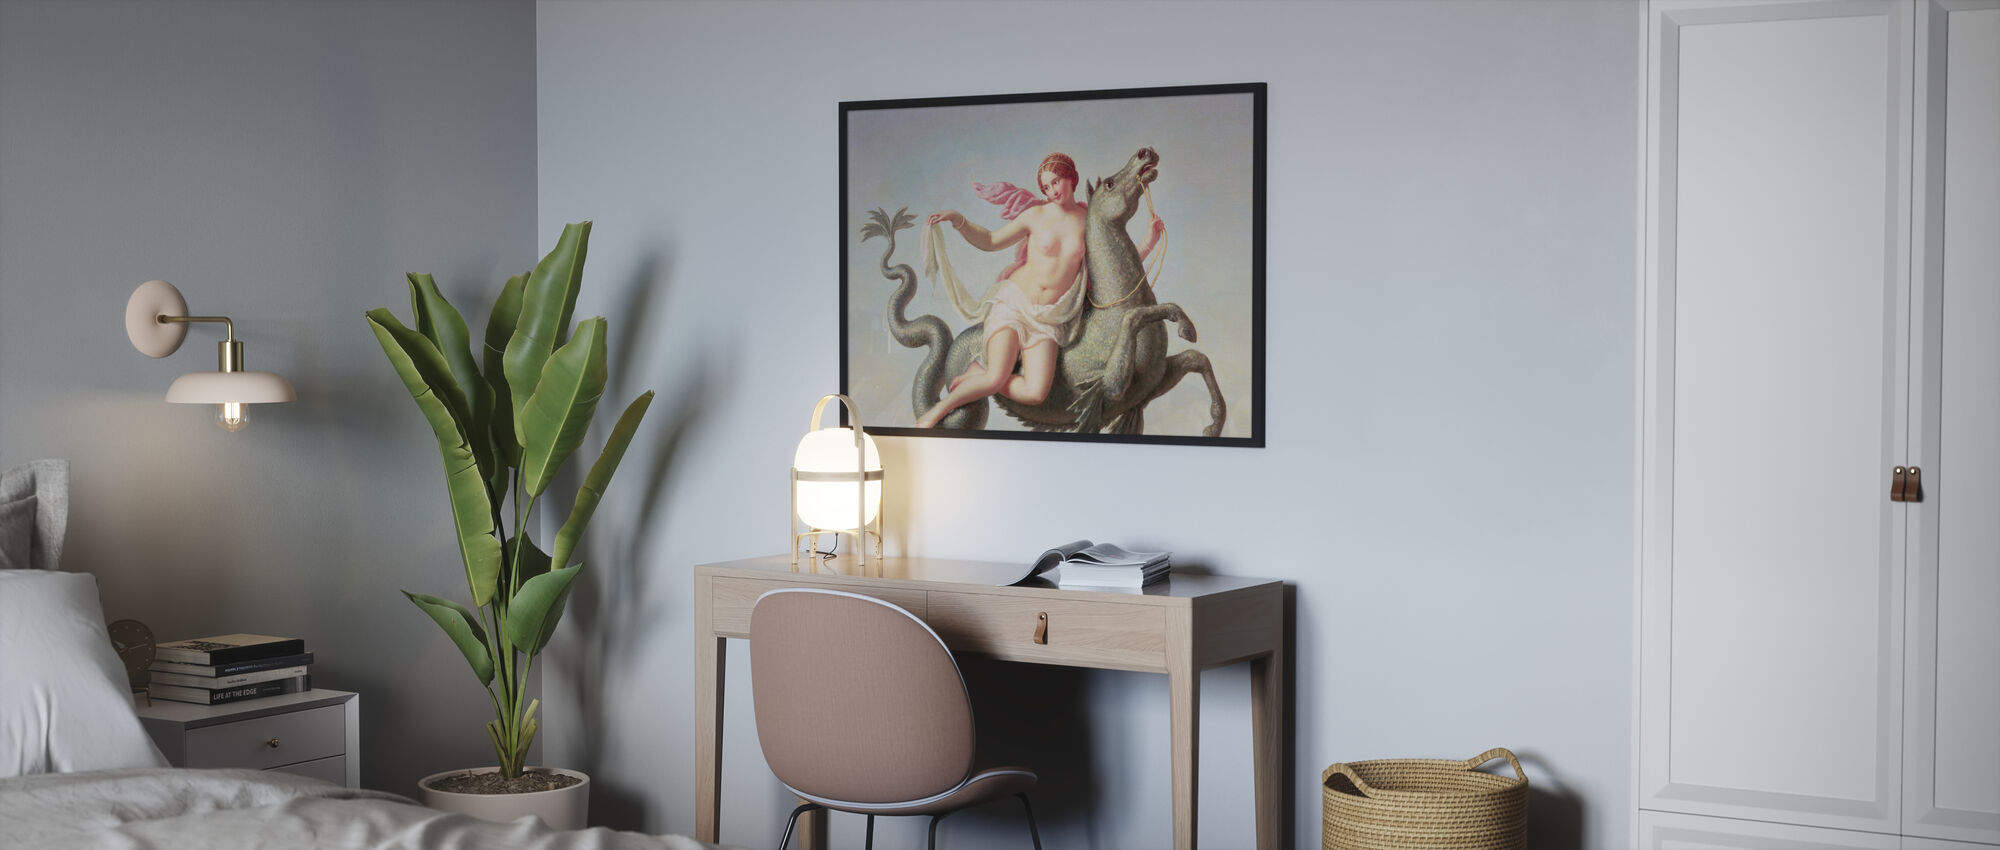 Escape of Galatea - Michelangelo Maestri - Framed print - Bedroom